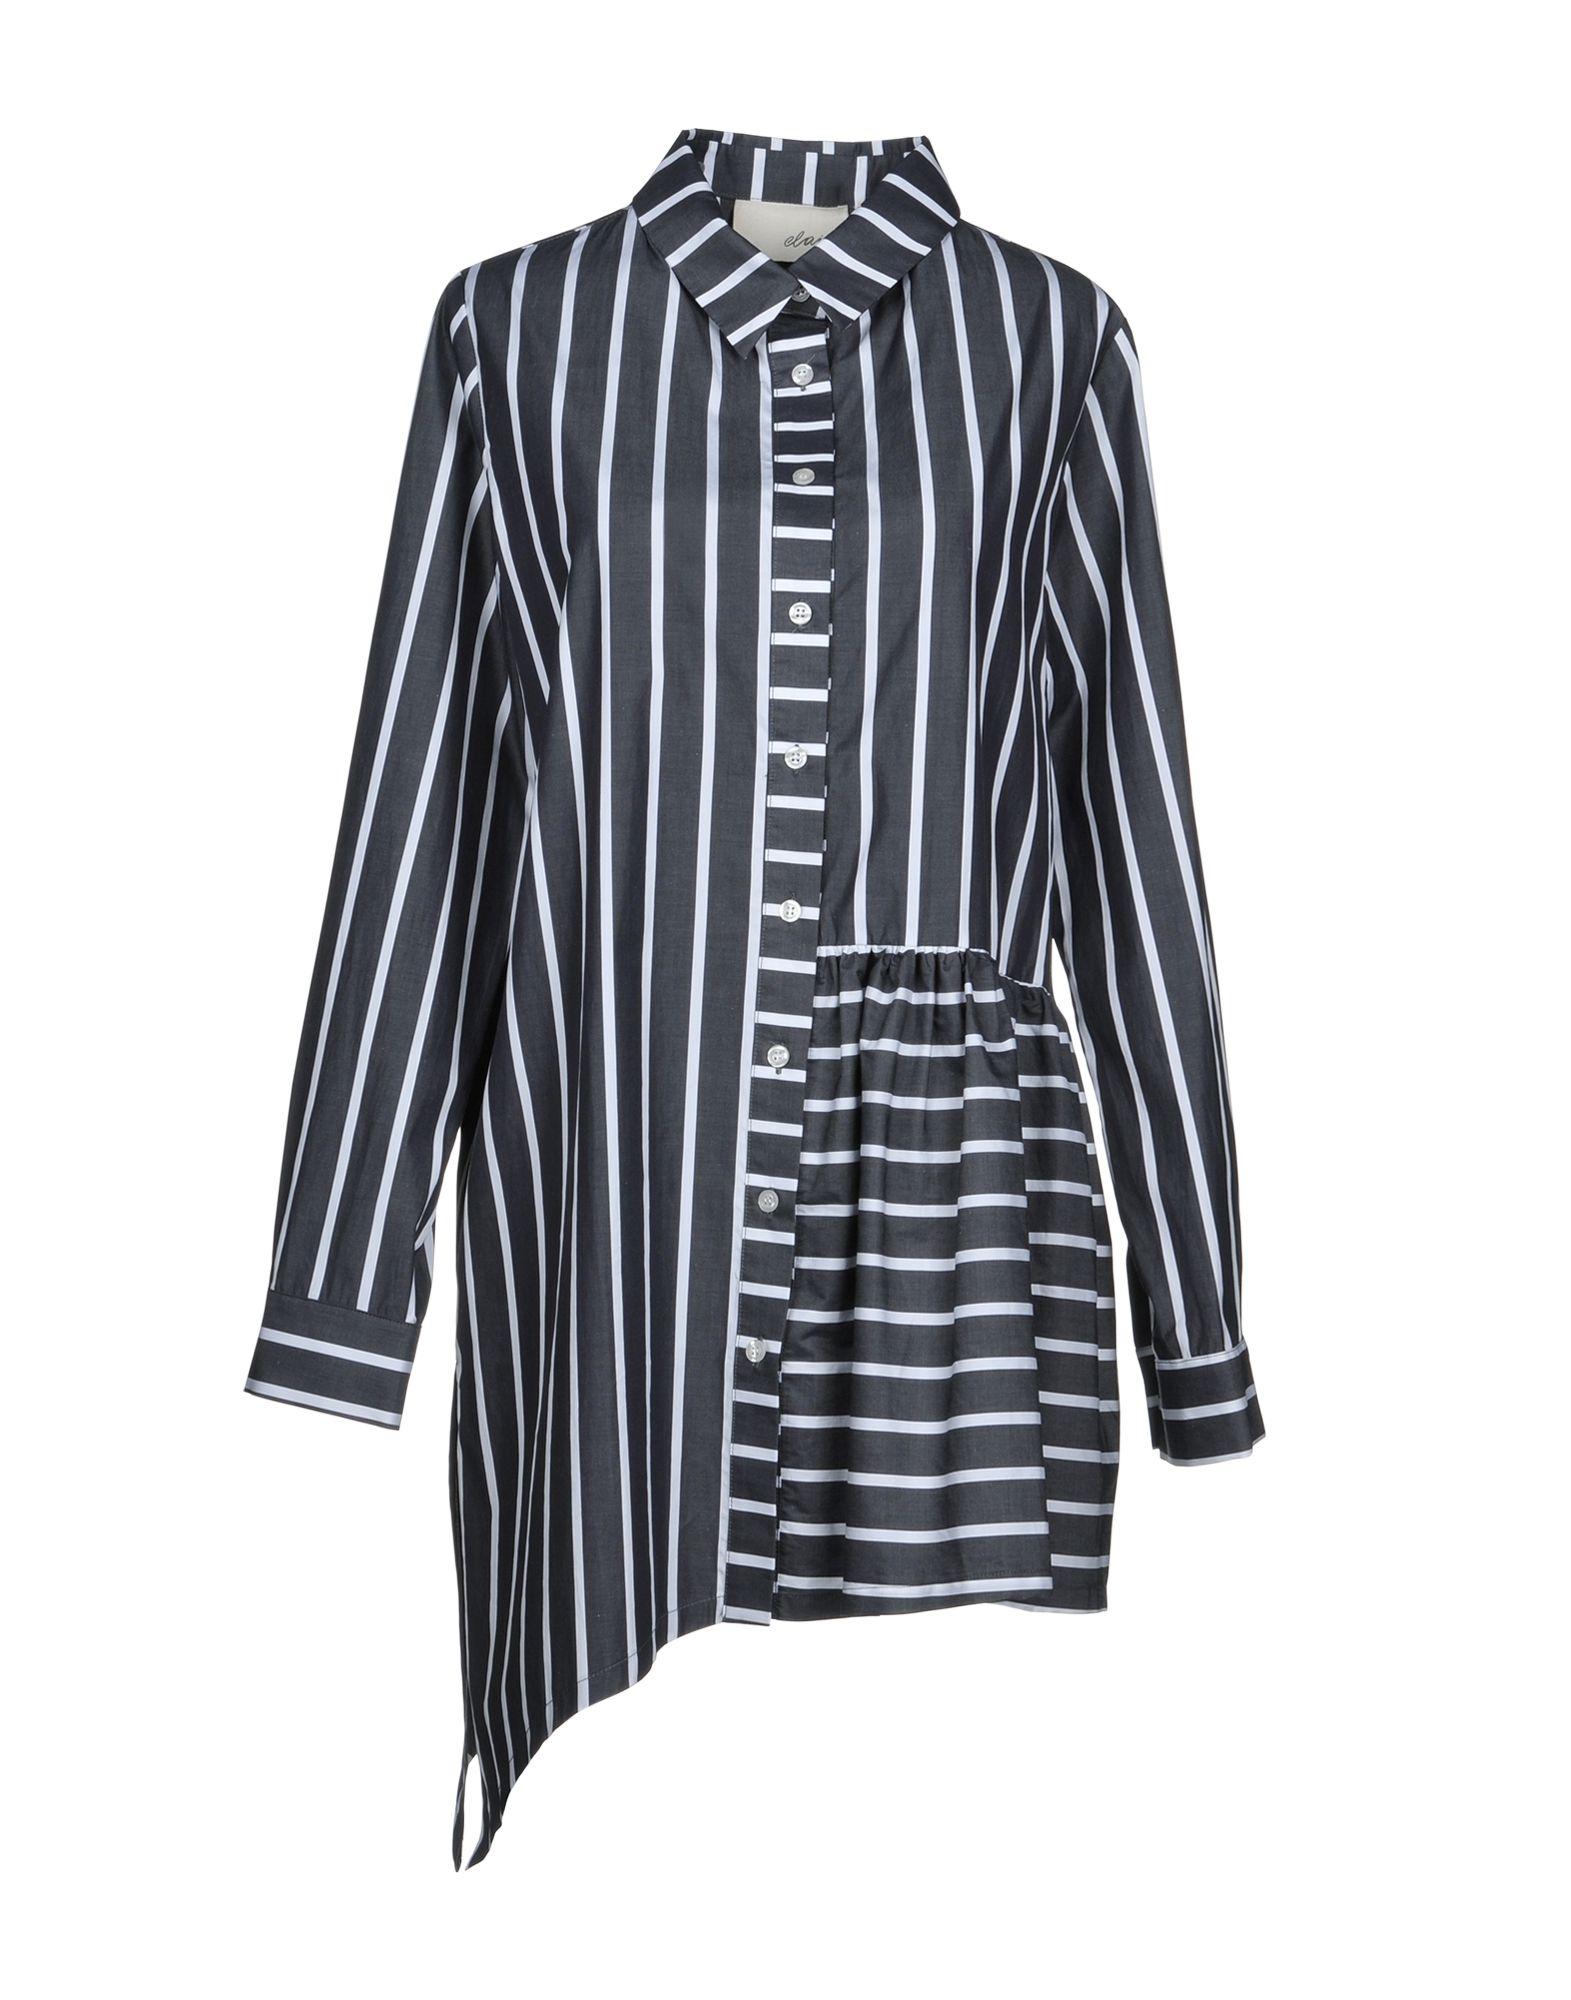 ELAIDI Striped Shirt in Lead